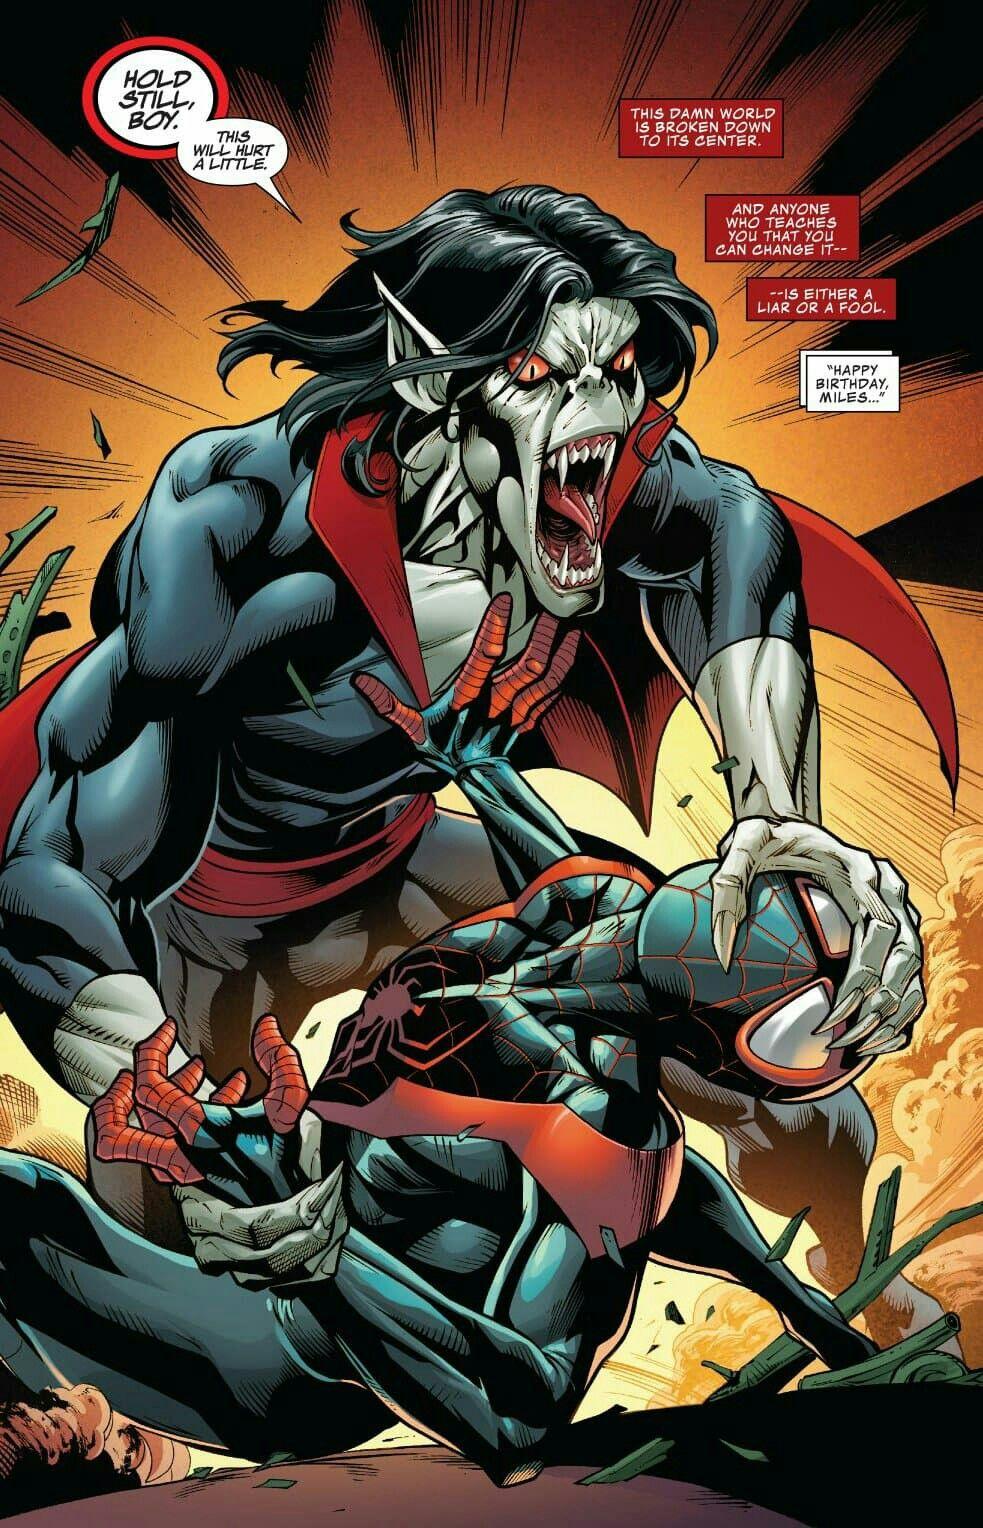 Pin By Santiago Castrillo On 1 Marvel Morbius The Living Vampire Marvel Comics Art Superhero